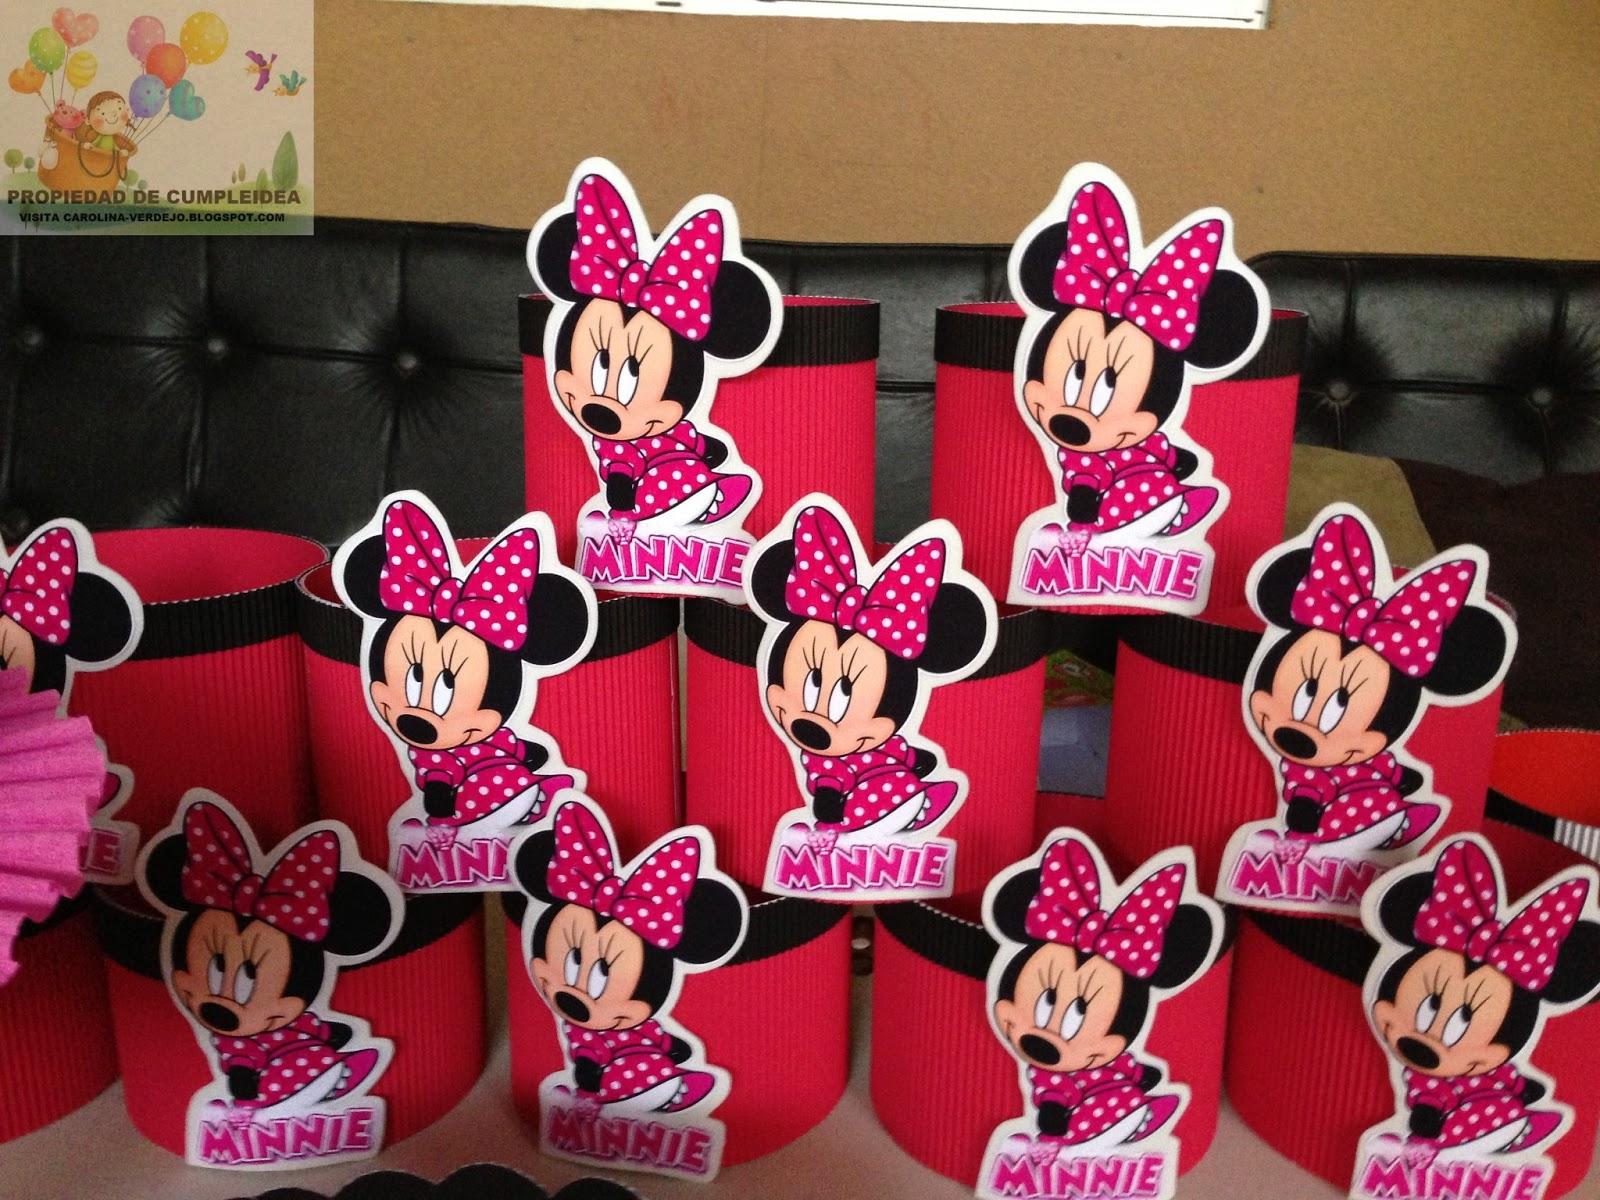 Minnie decoraciones fiestas infantiles for Decoracion de minnie mouse